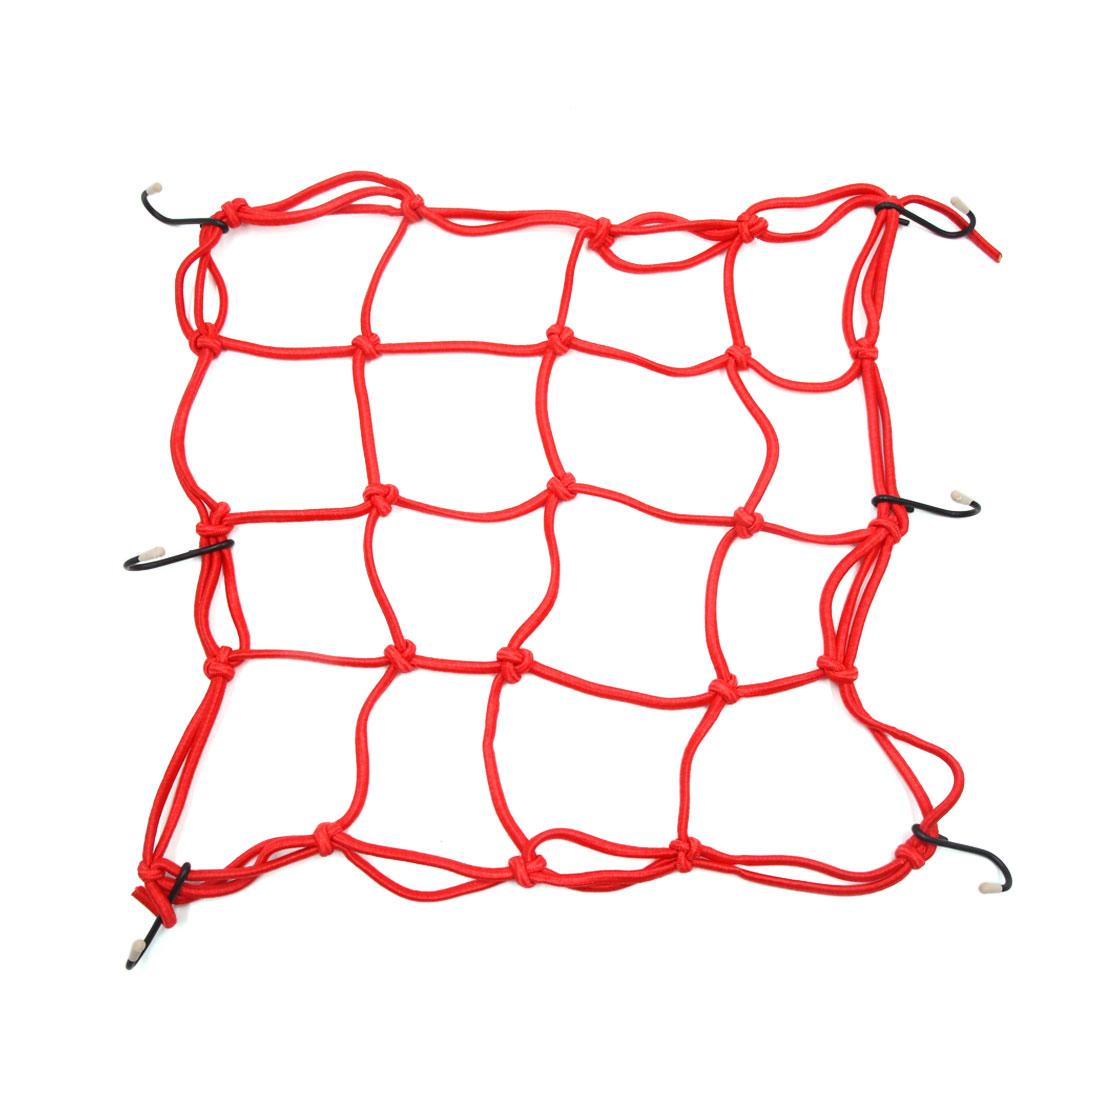 13'' x 13'' Red Elastic Helmet Cargo Luggage Storage Mesh Bungee Net for Bike Bicycle